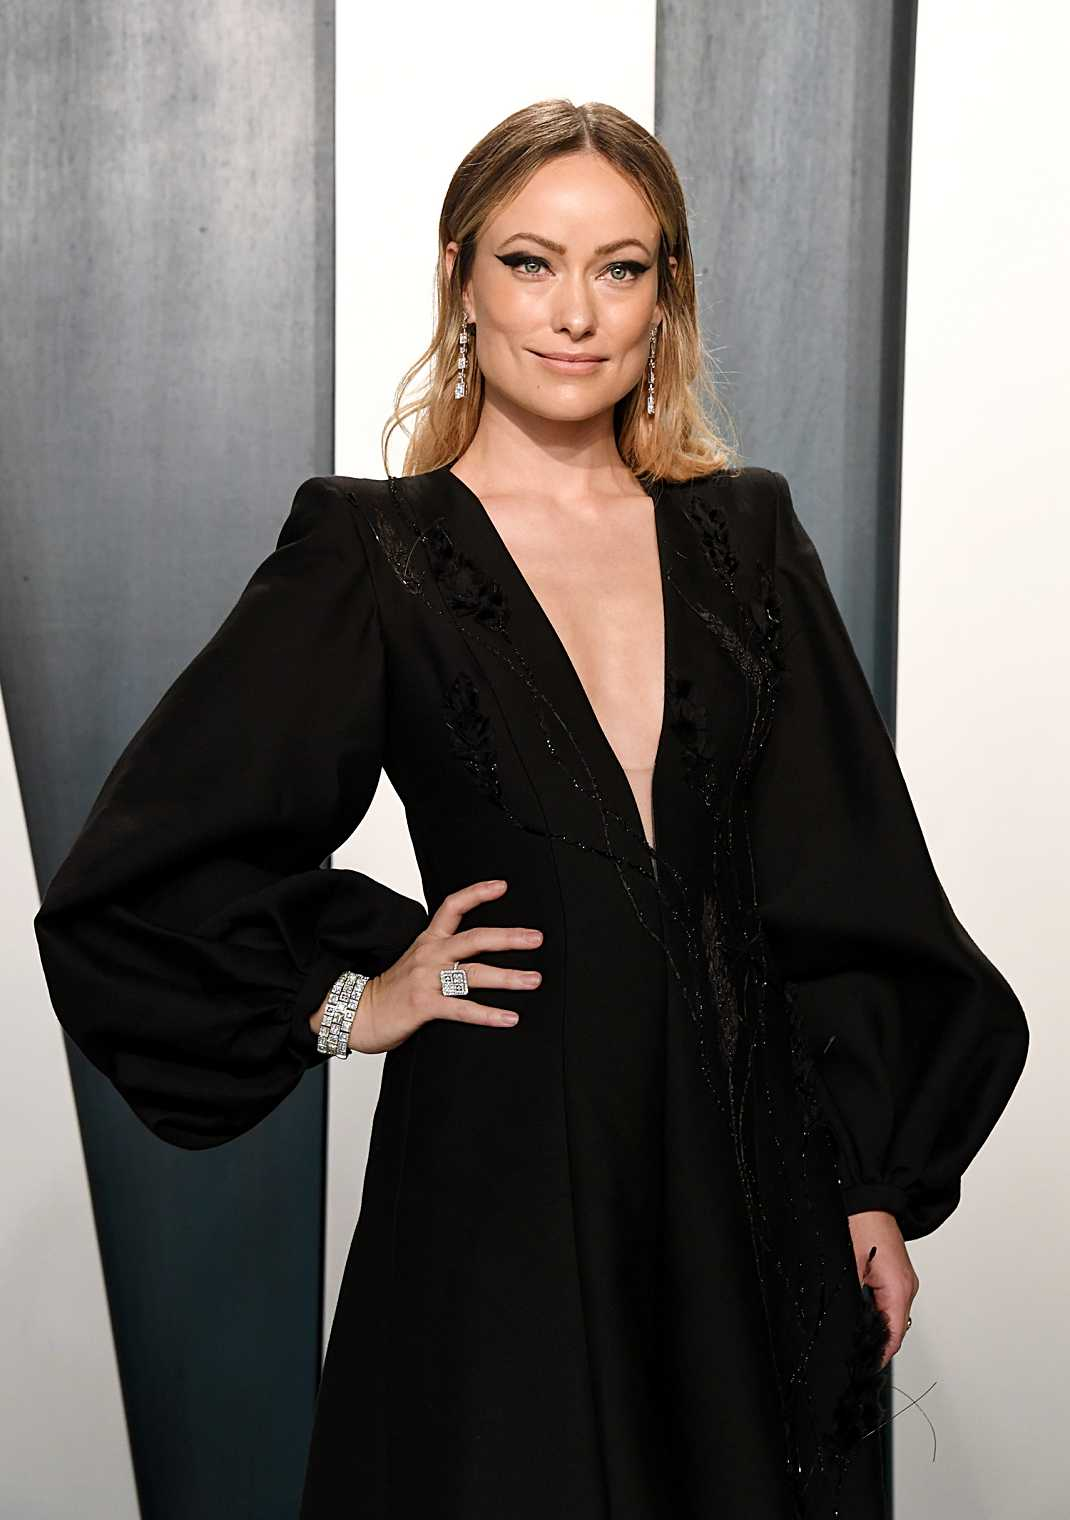 Actress And Award Winning Filmmaker Olivia Wilde Graced The 2020 Vanity Fair Oscar Party Wearing Niwaka Fine Jewelry